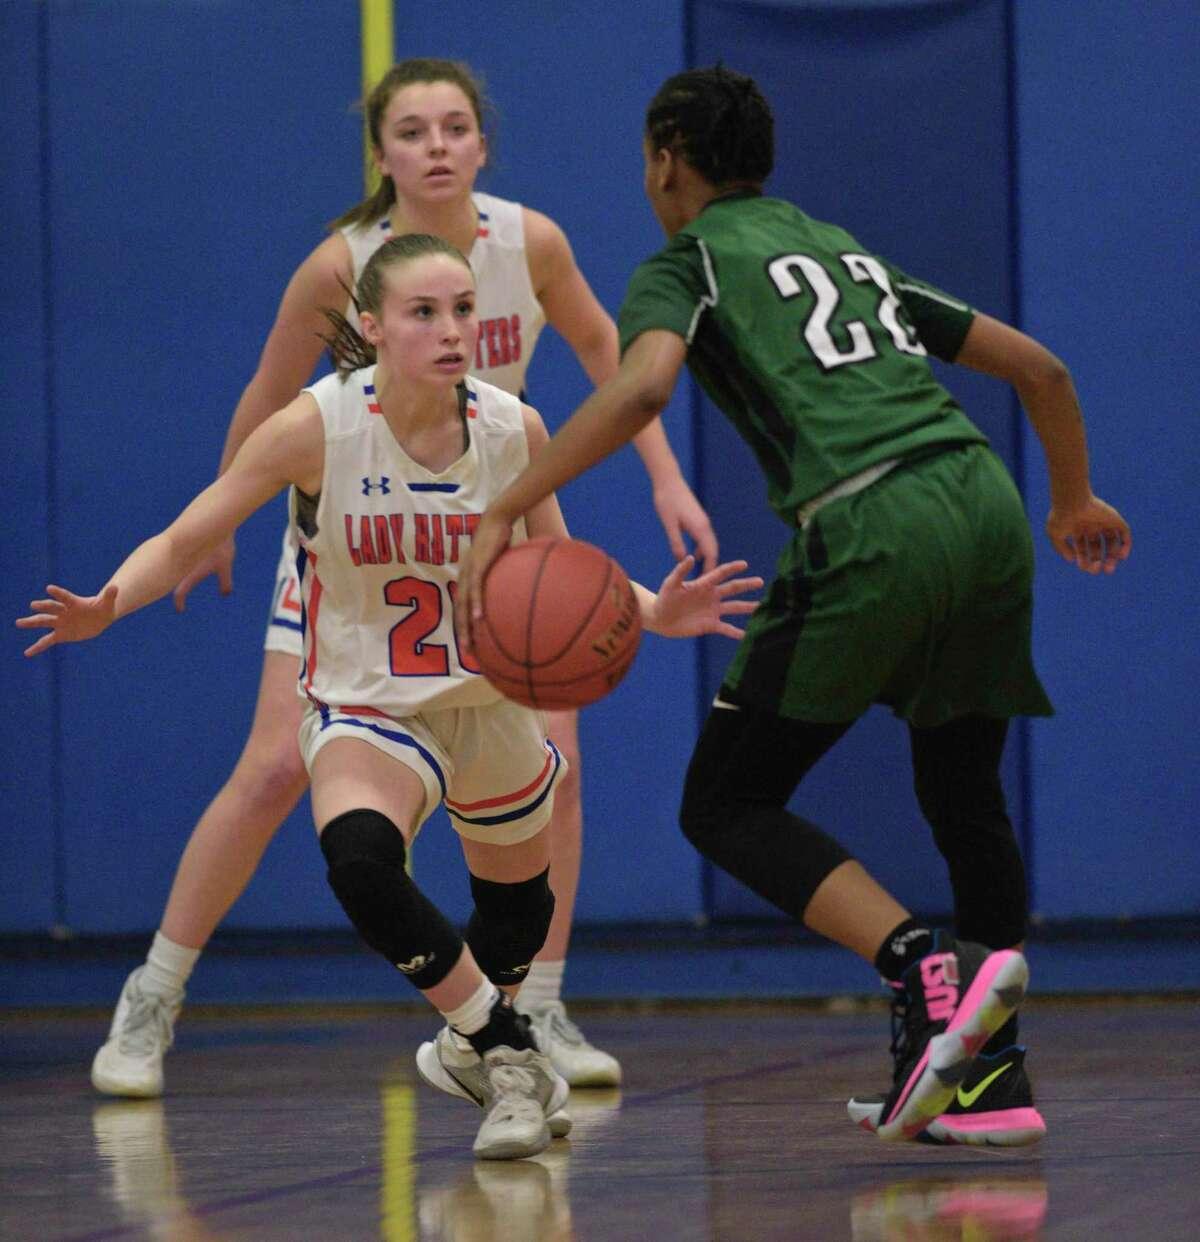 Girls basketball game between Norwalk and Danbury high schools, Thursday night, February 6, 2020, at Danbury High School, in Danbury, Conn.